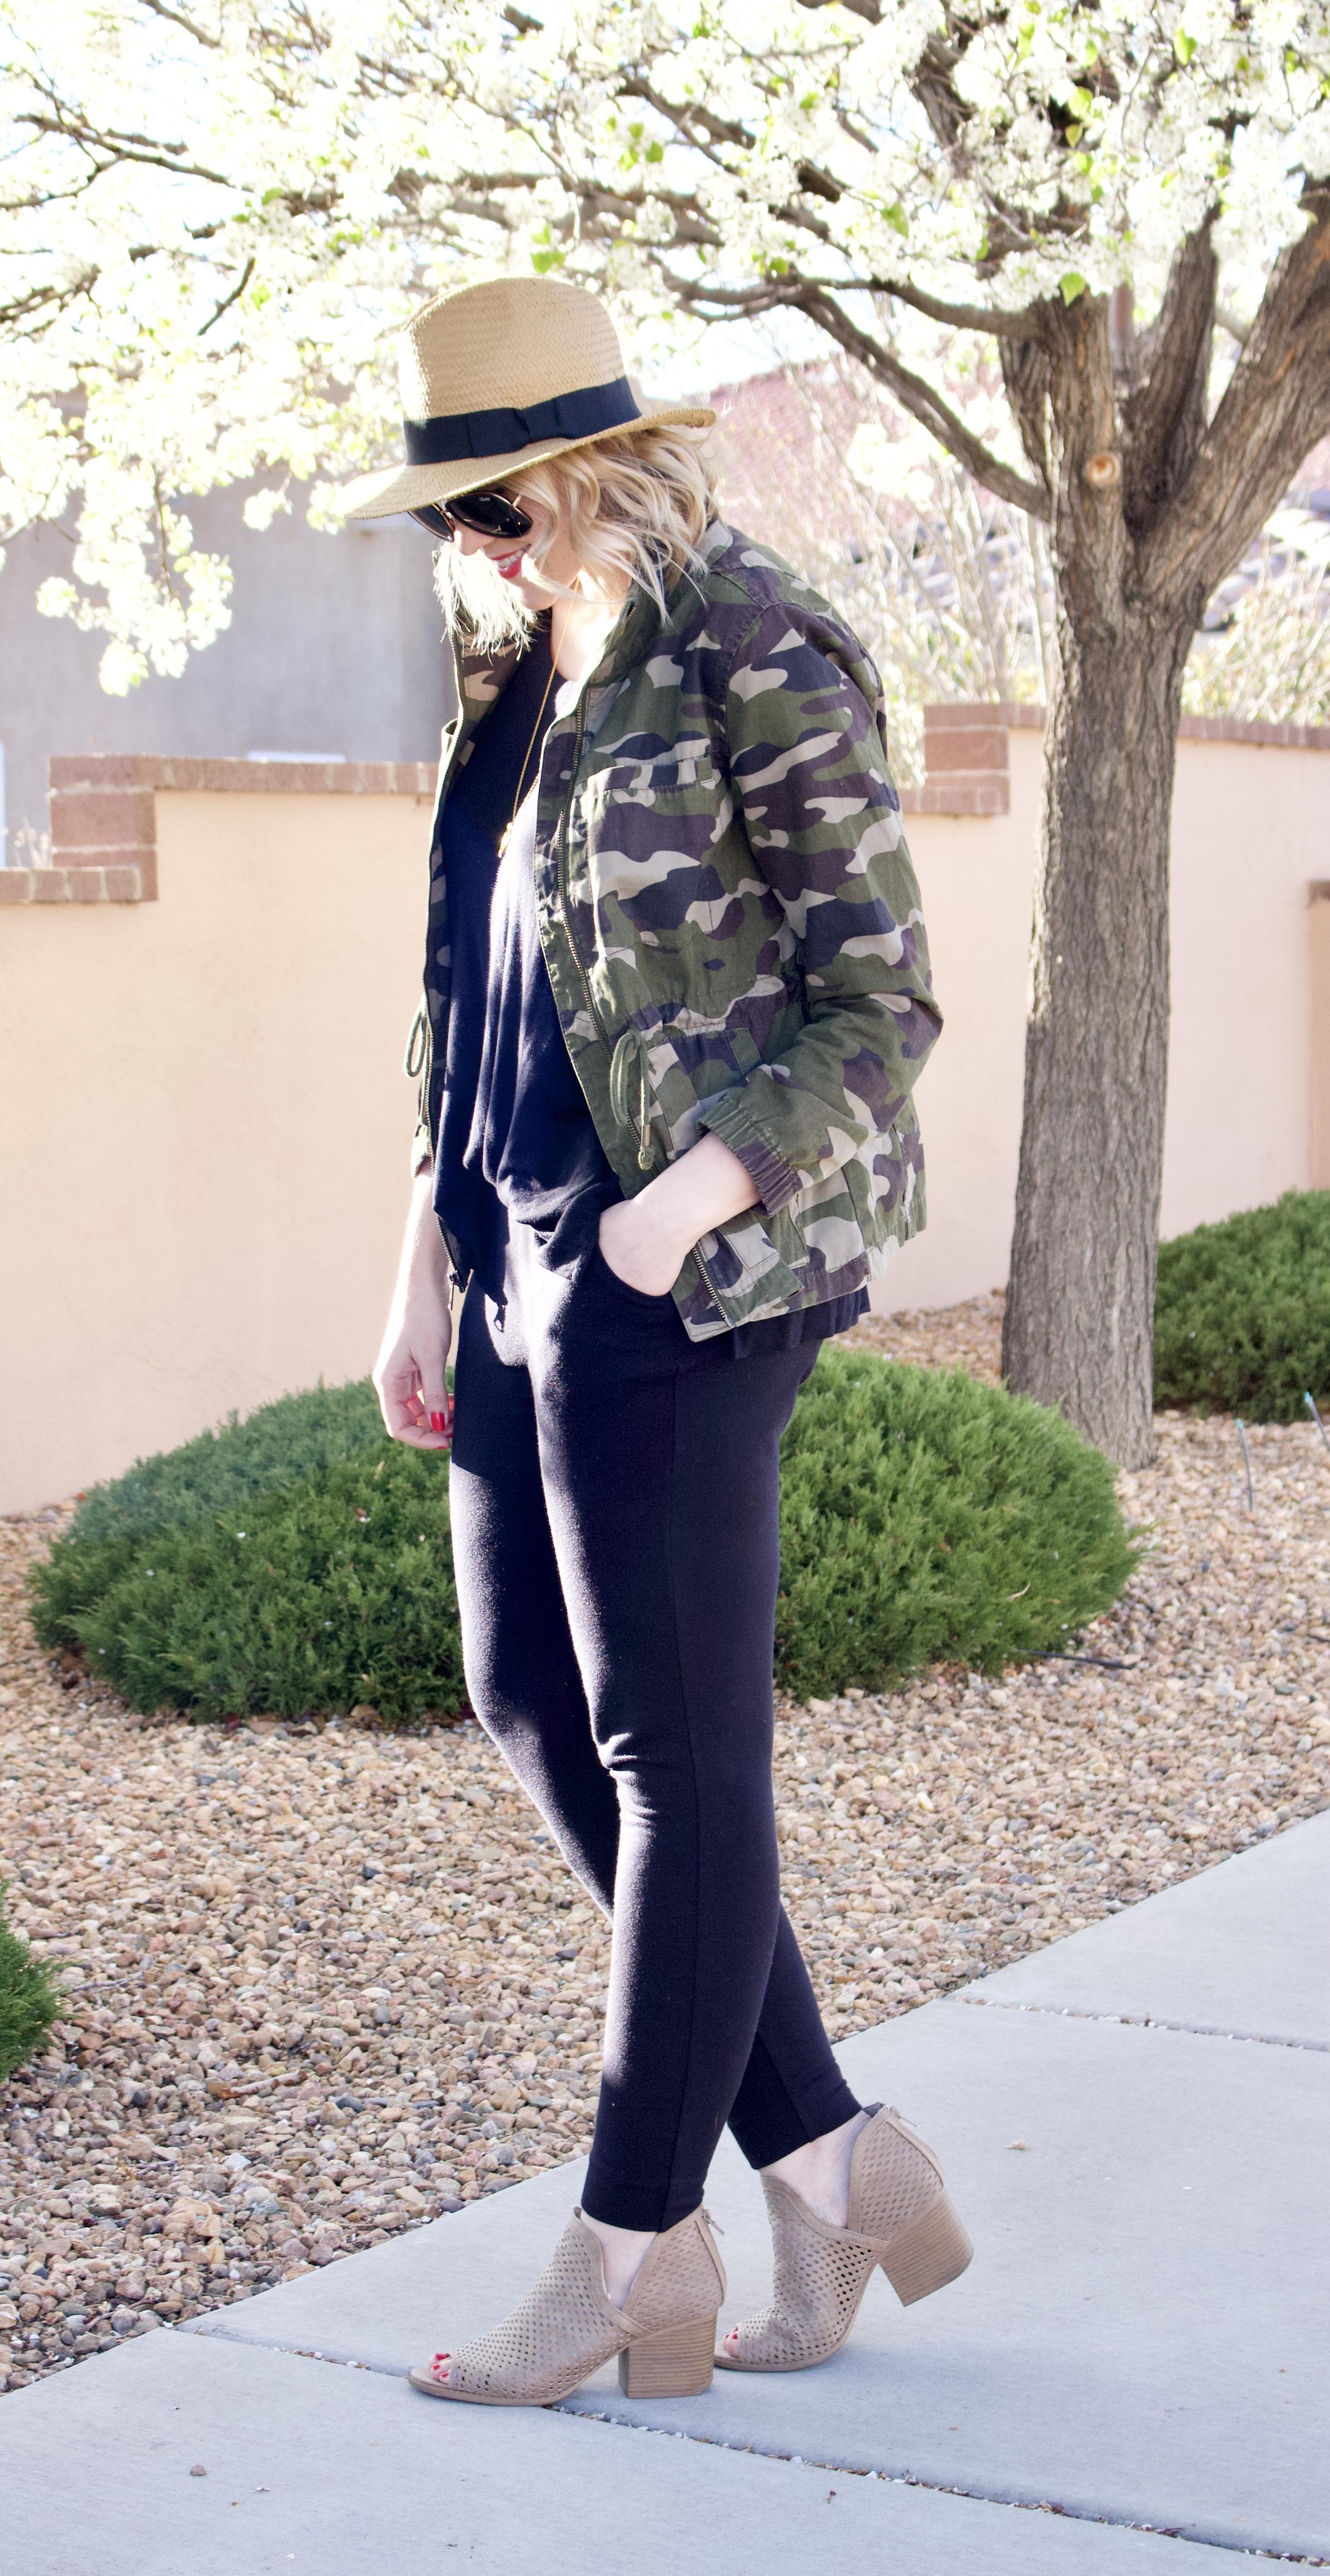 camo jacket old navy twill jacket #oldnavystyle #camojacket #camoprint